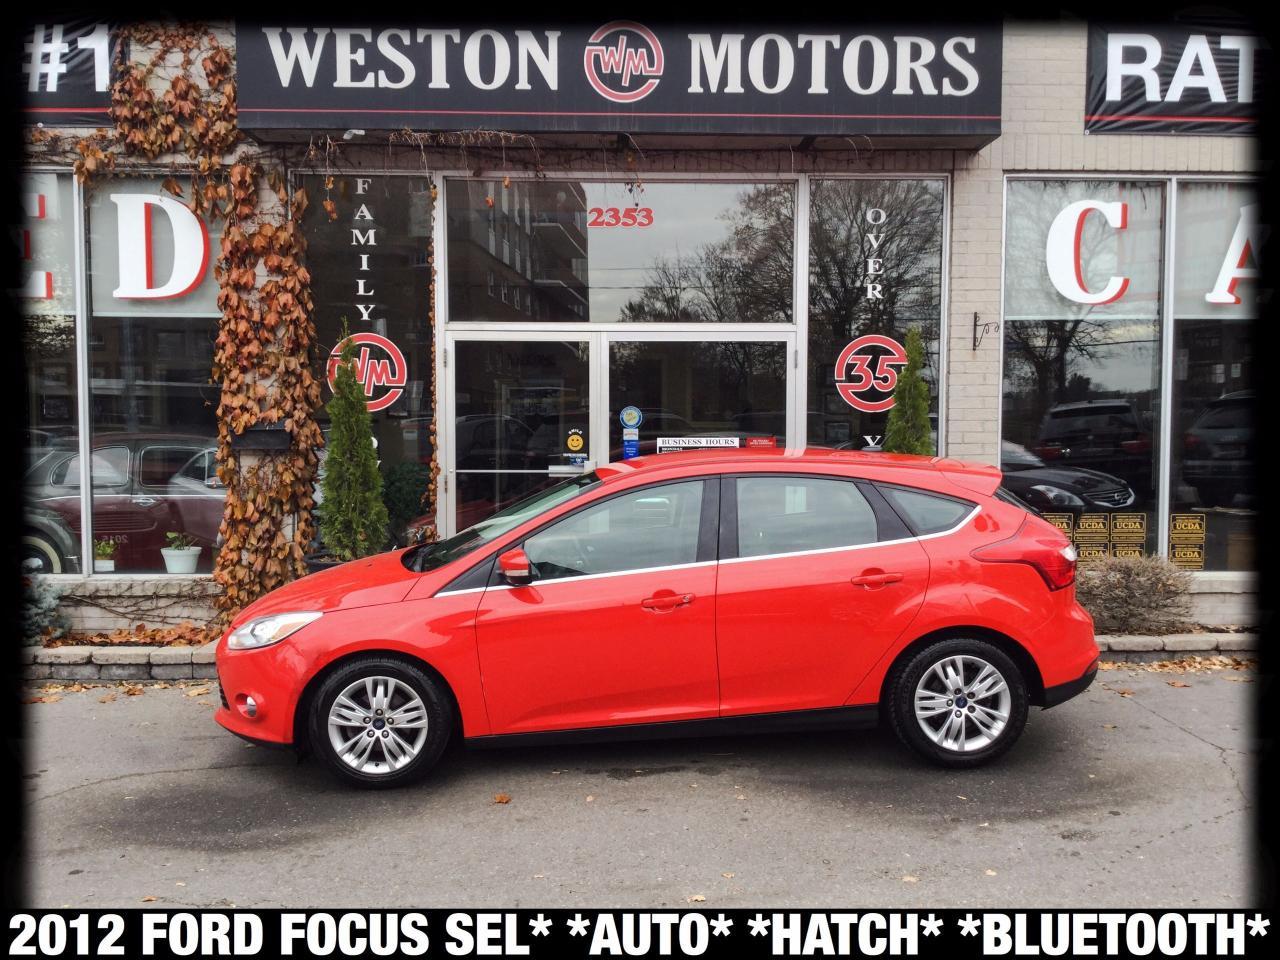 2012 Ford Focus SEL*AUTO*HATCH*BLUETOOTH*